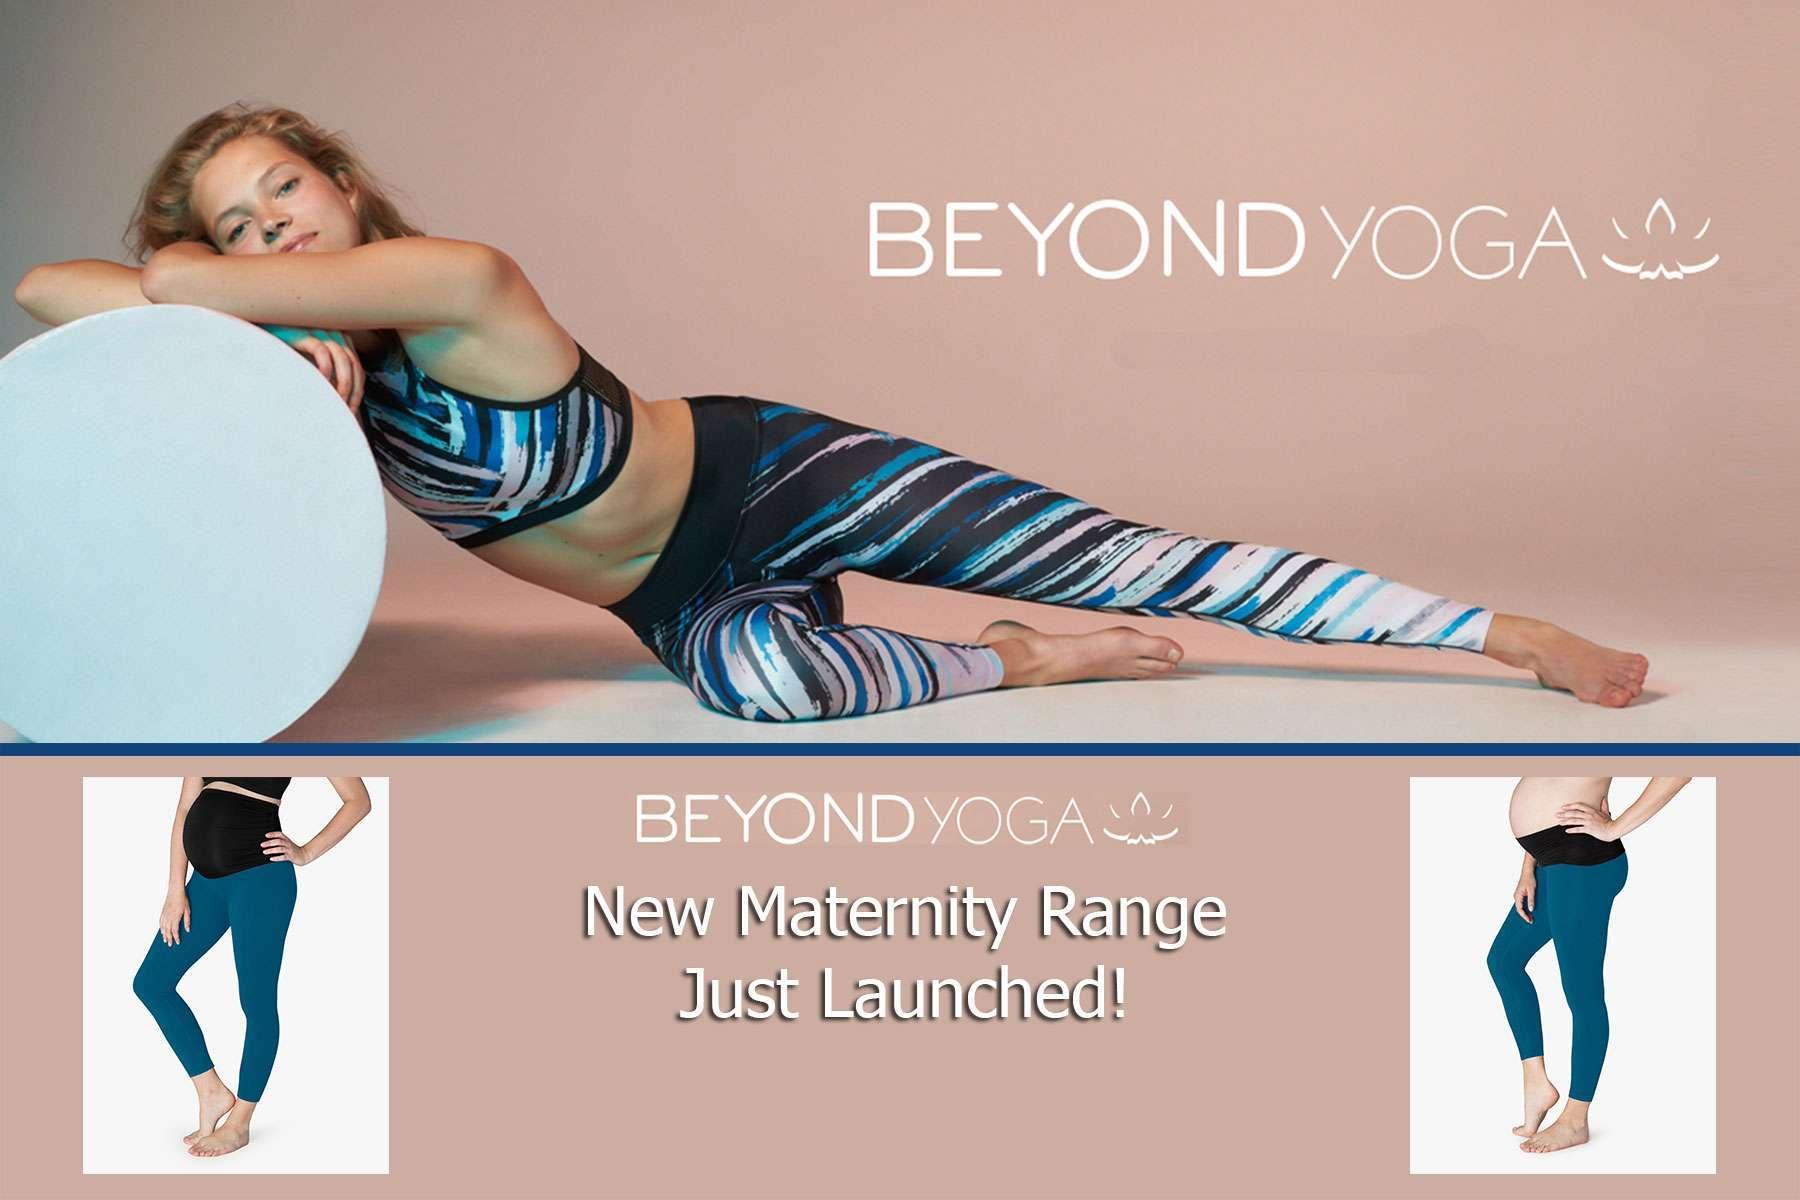 Beyond yoga high quality activewear